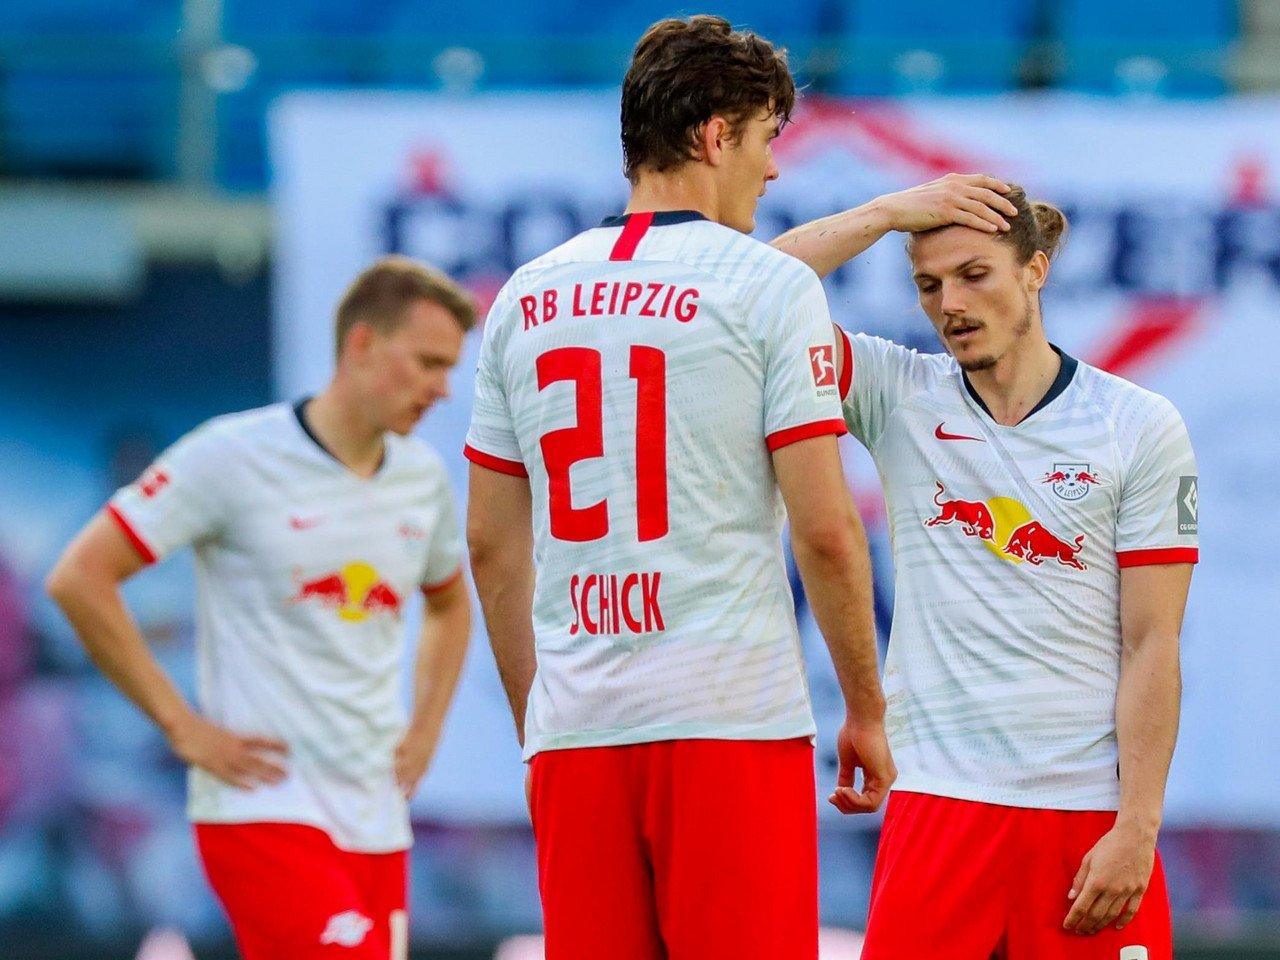 RB Leipzig Title Hopes Set Back After Draw To Freiburg